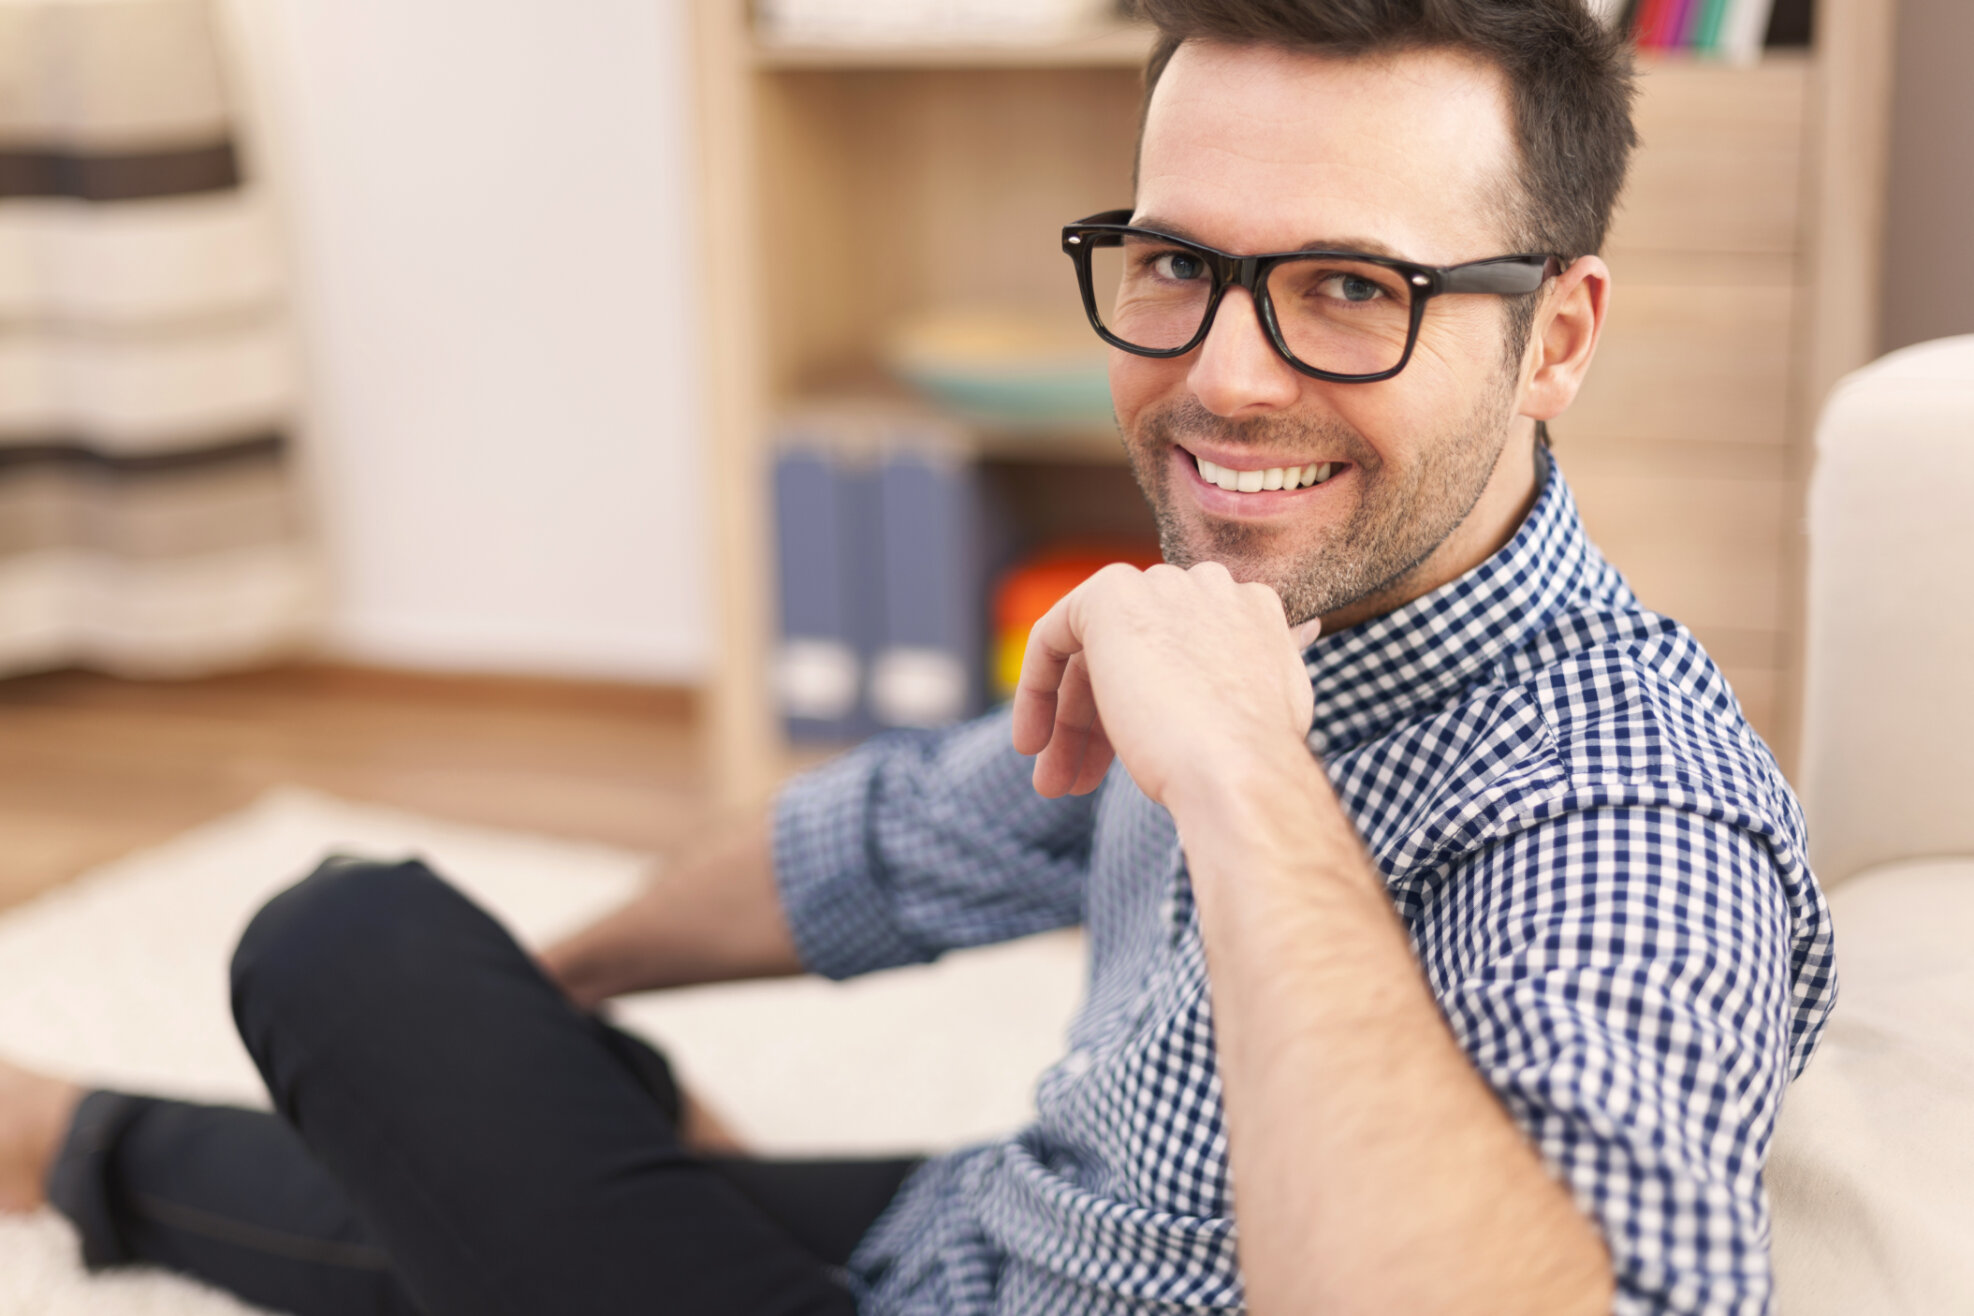 Vertikal Helse N3 172016045 mann briller